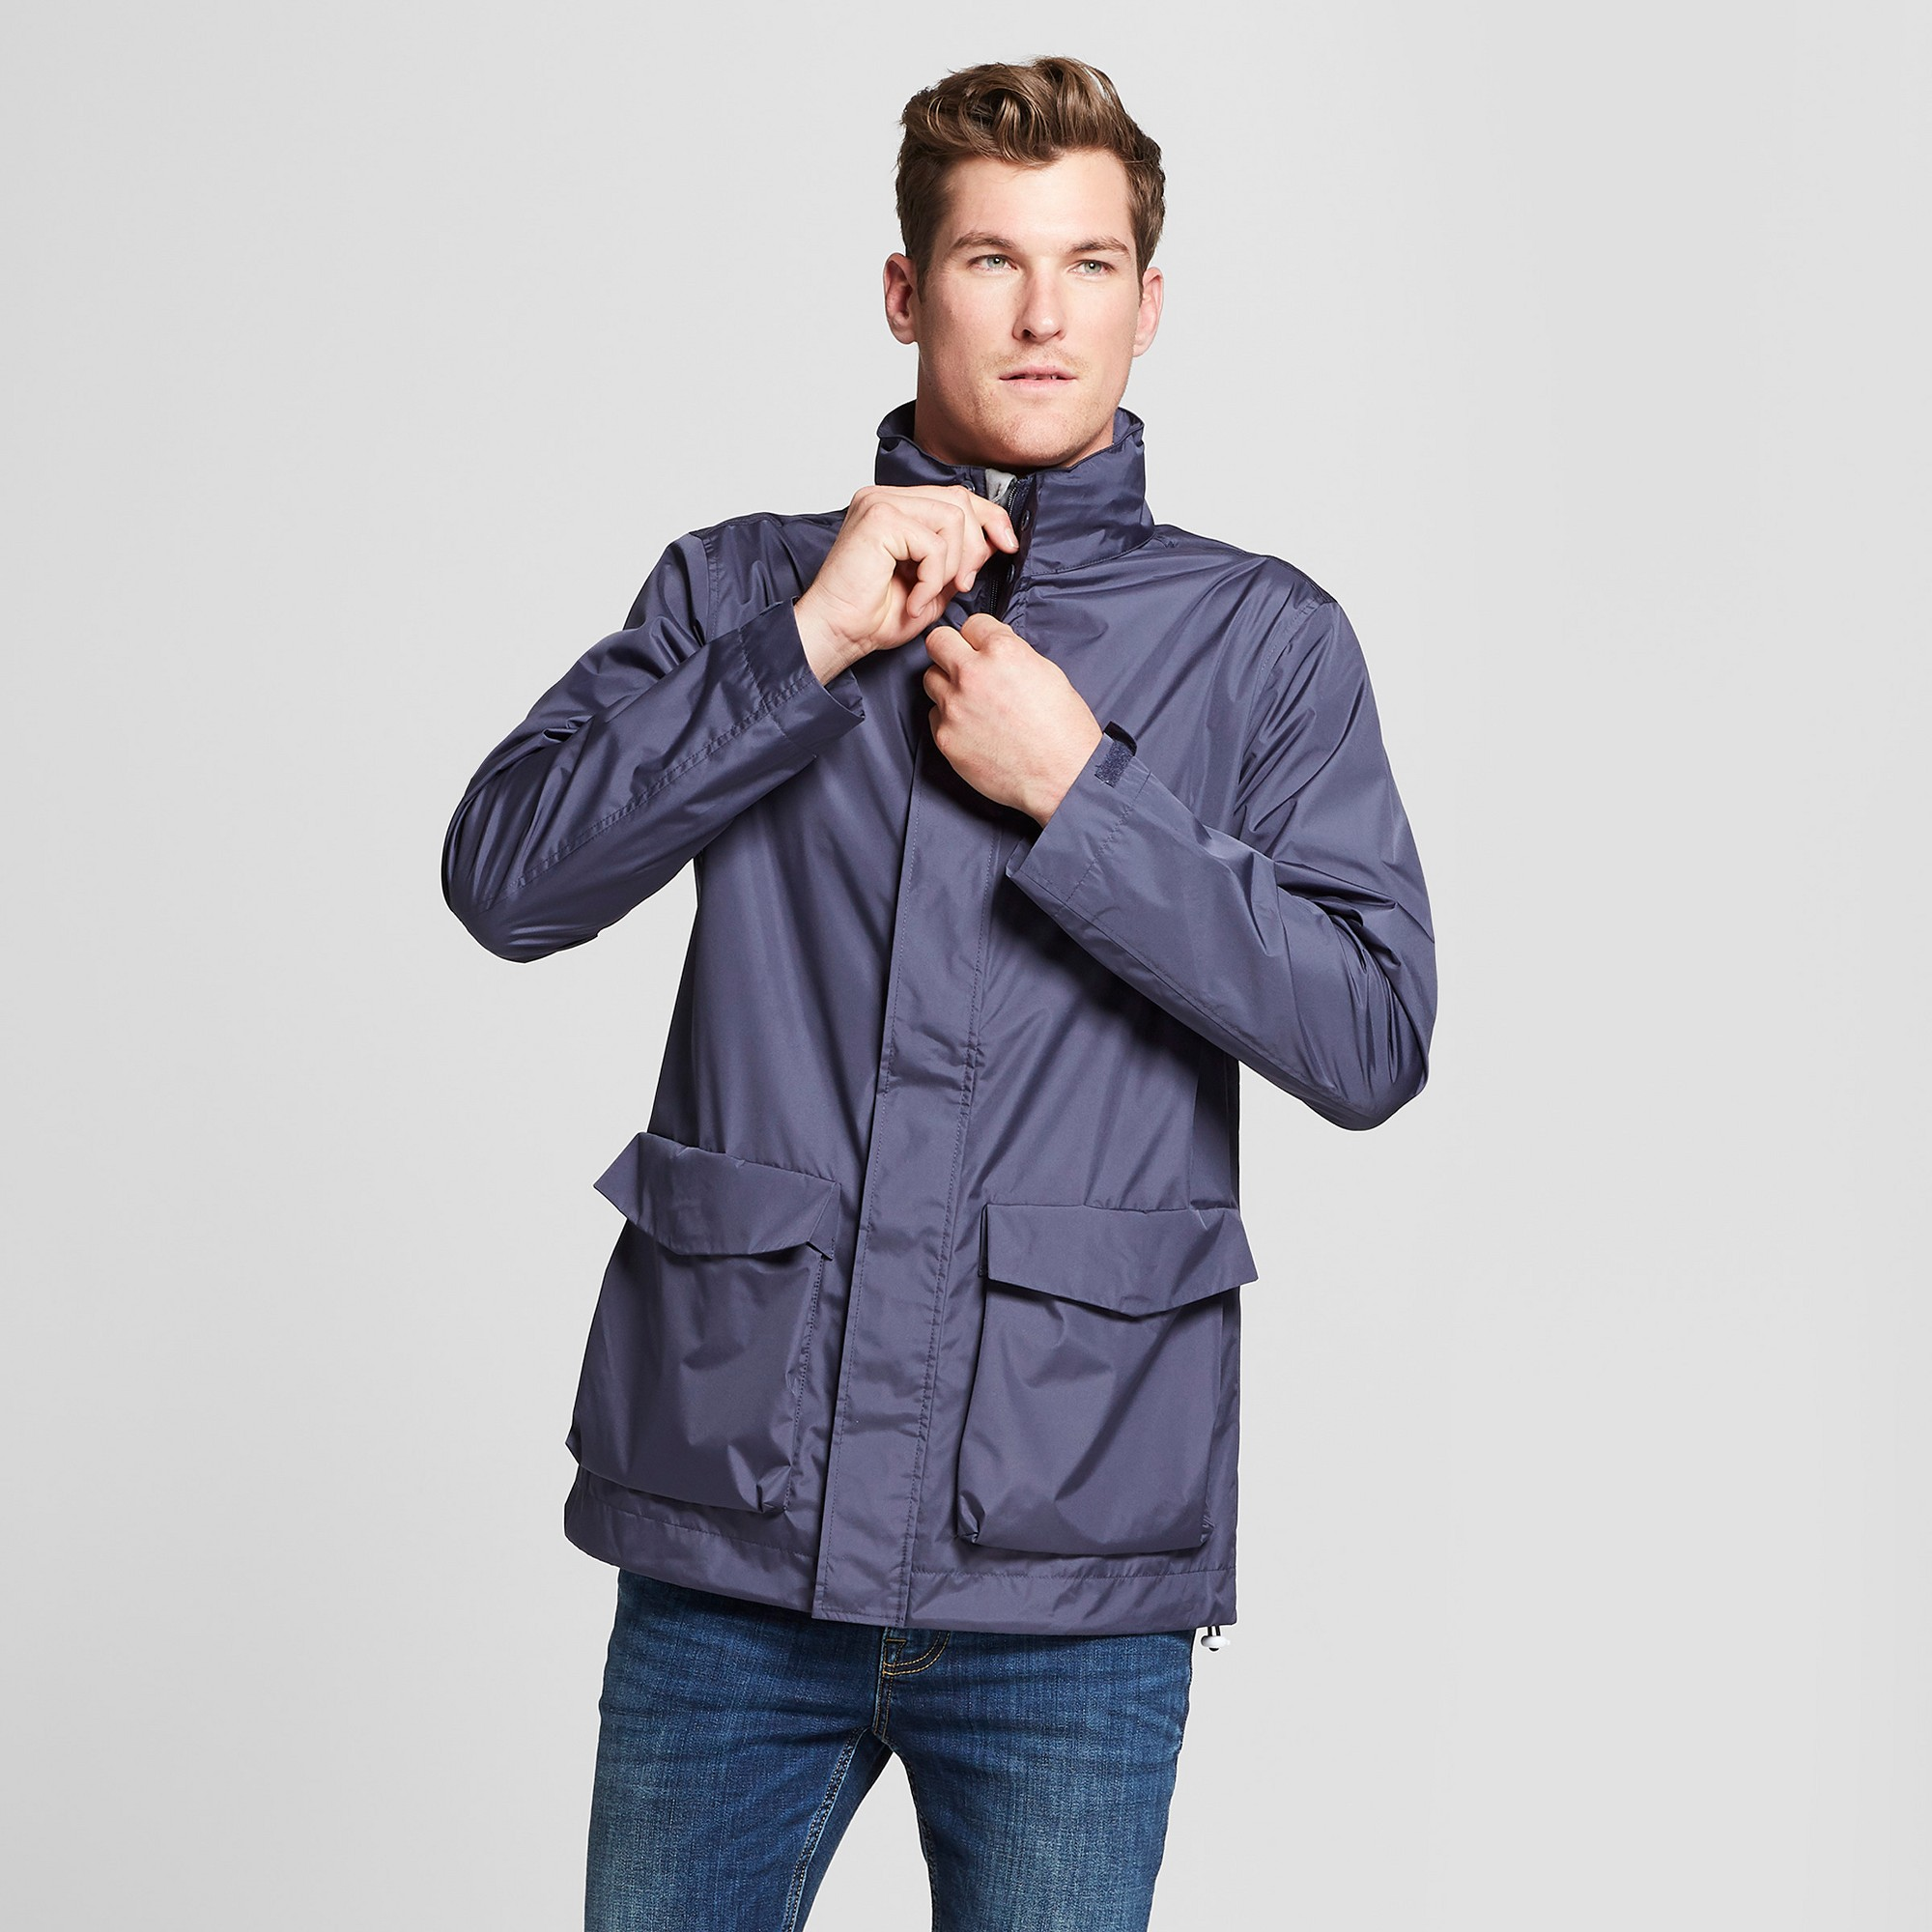 07165adb4 Men's Rain Jacket - Goodfellow & Co Geneva Blue M | Products